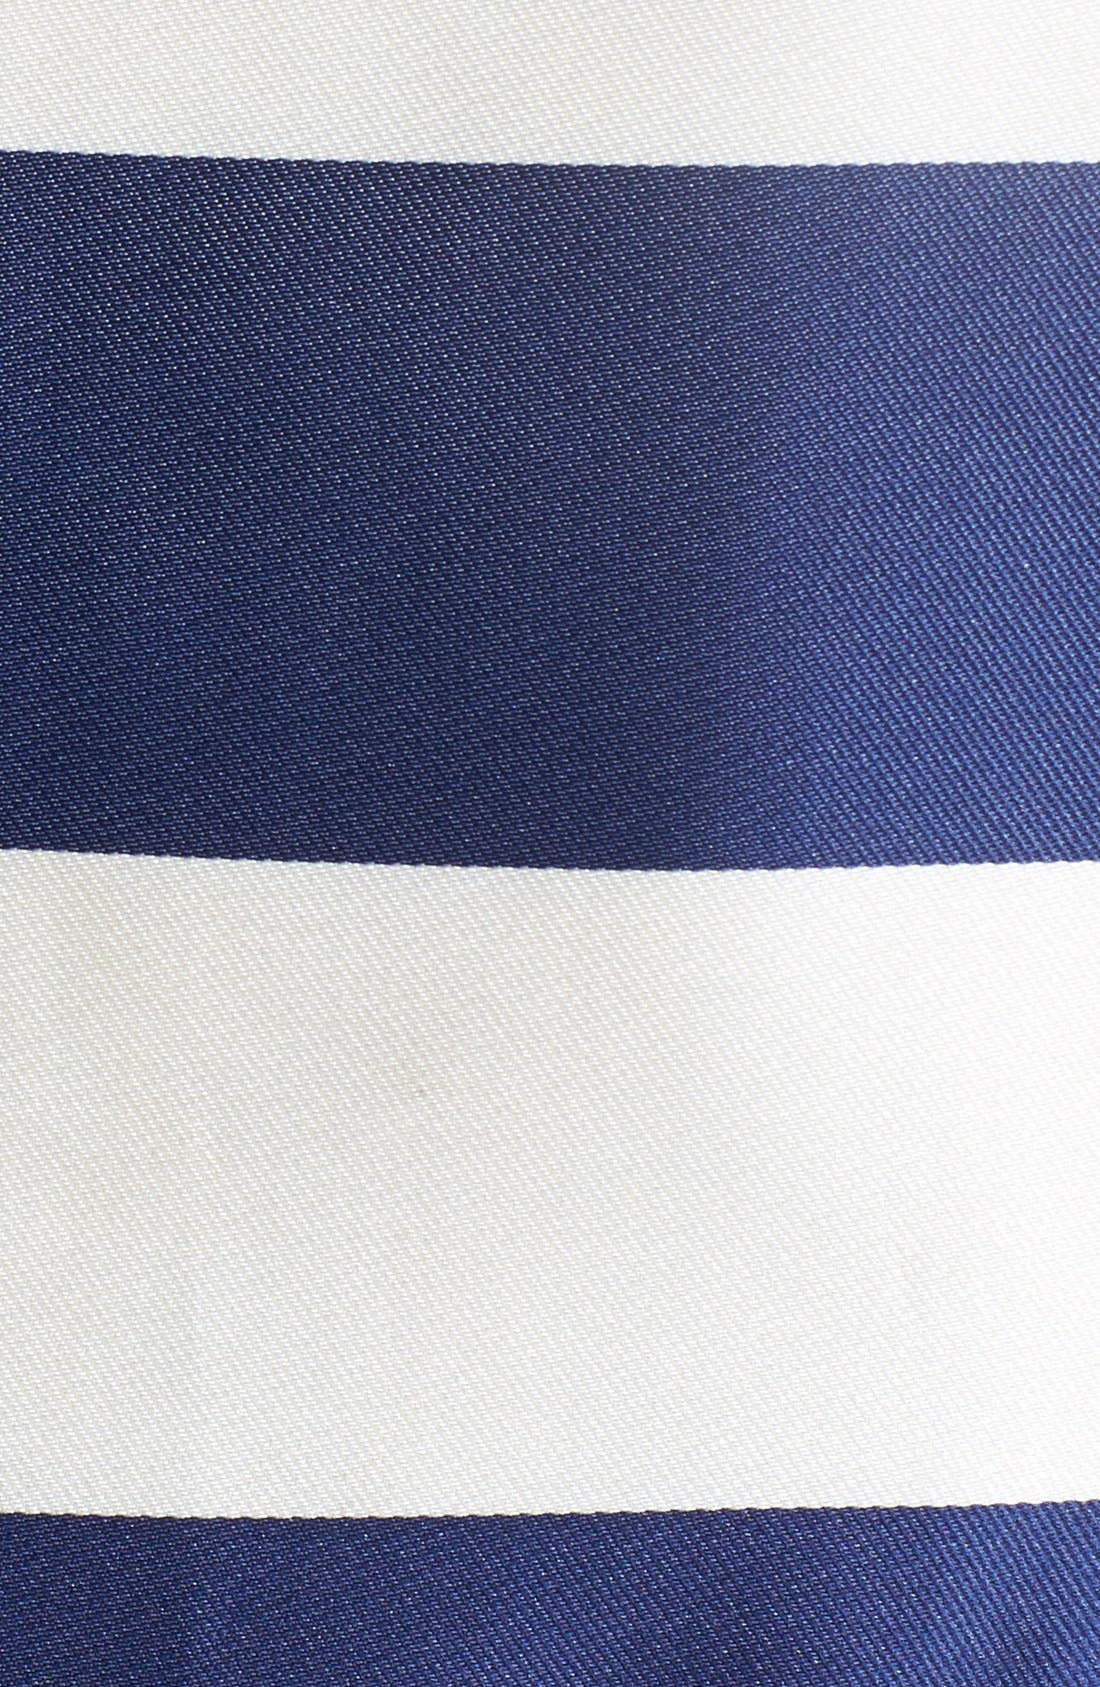 Alternate Image 4  - Donna Ricco Belted Stripe Matte Satin Dress